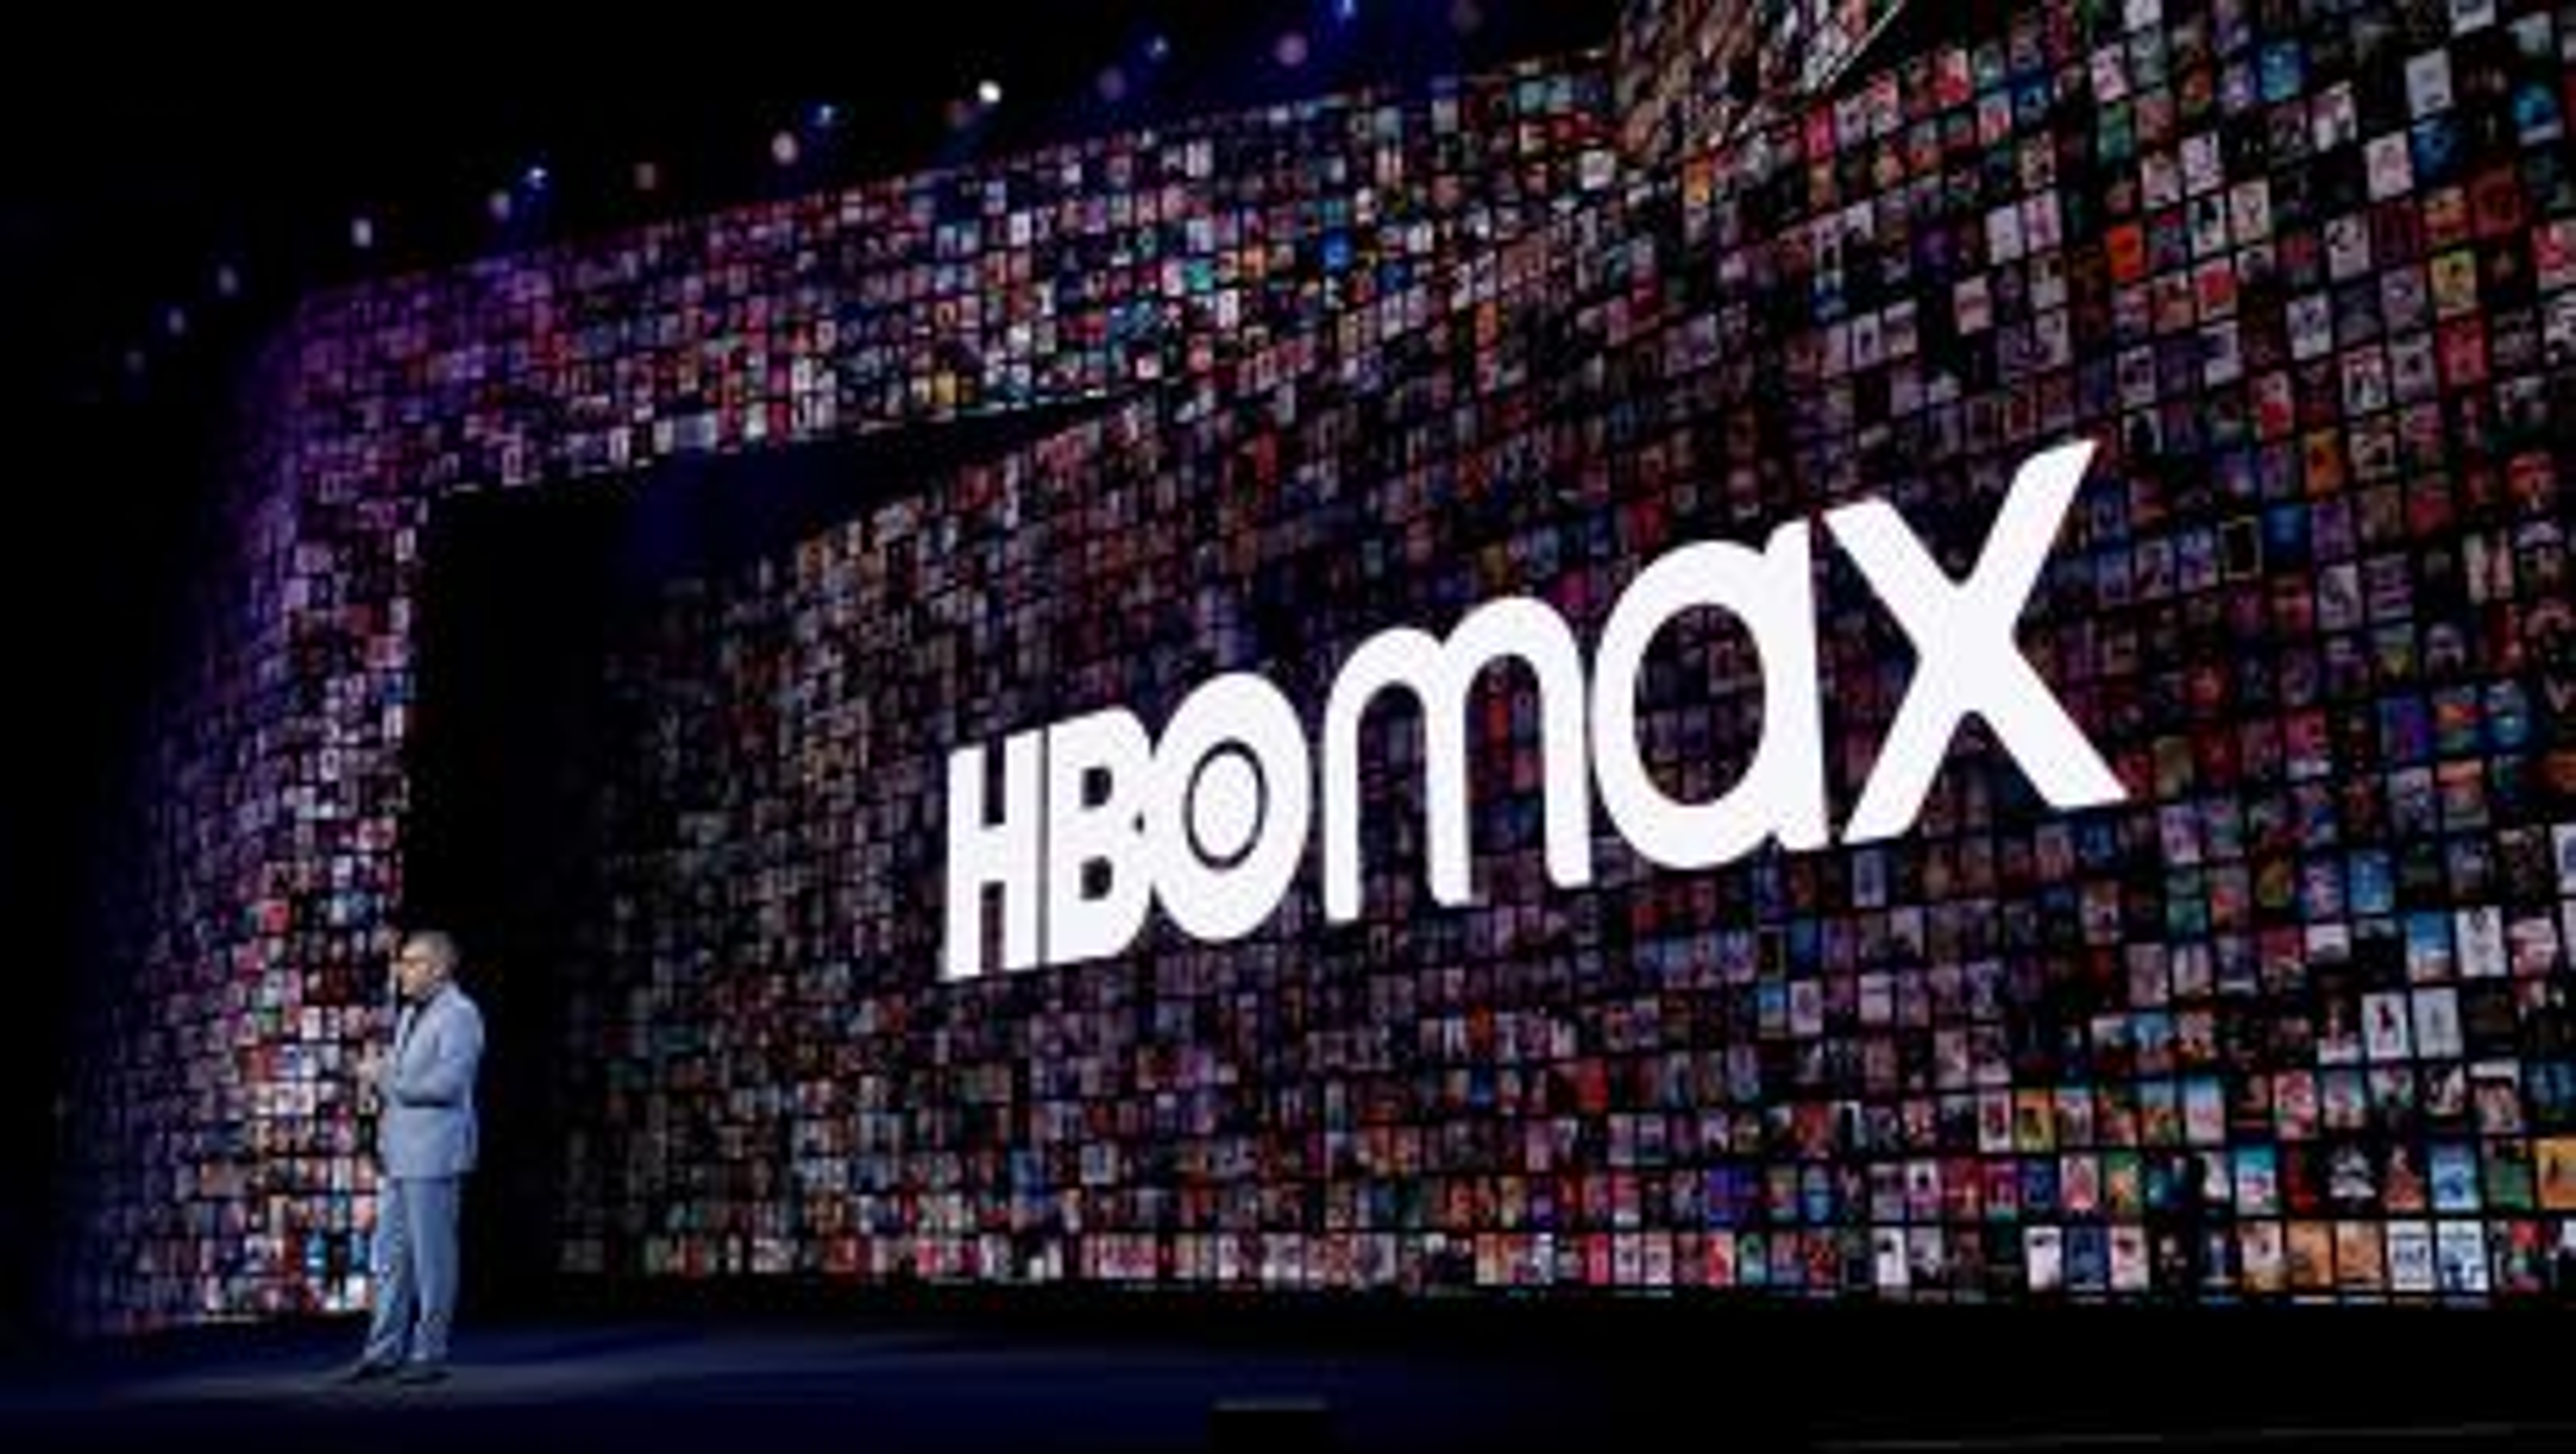 hbo max presentation